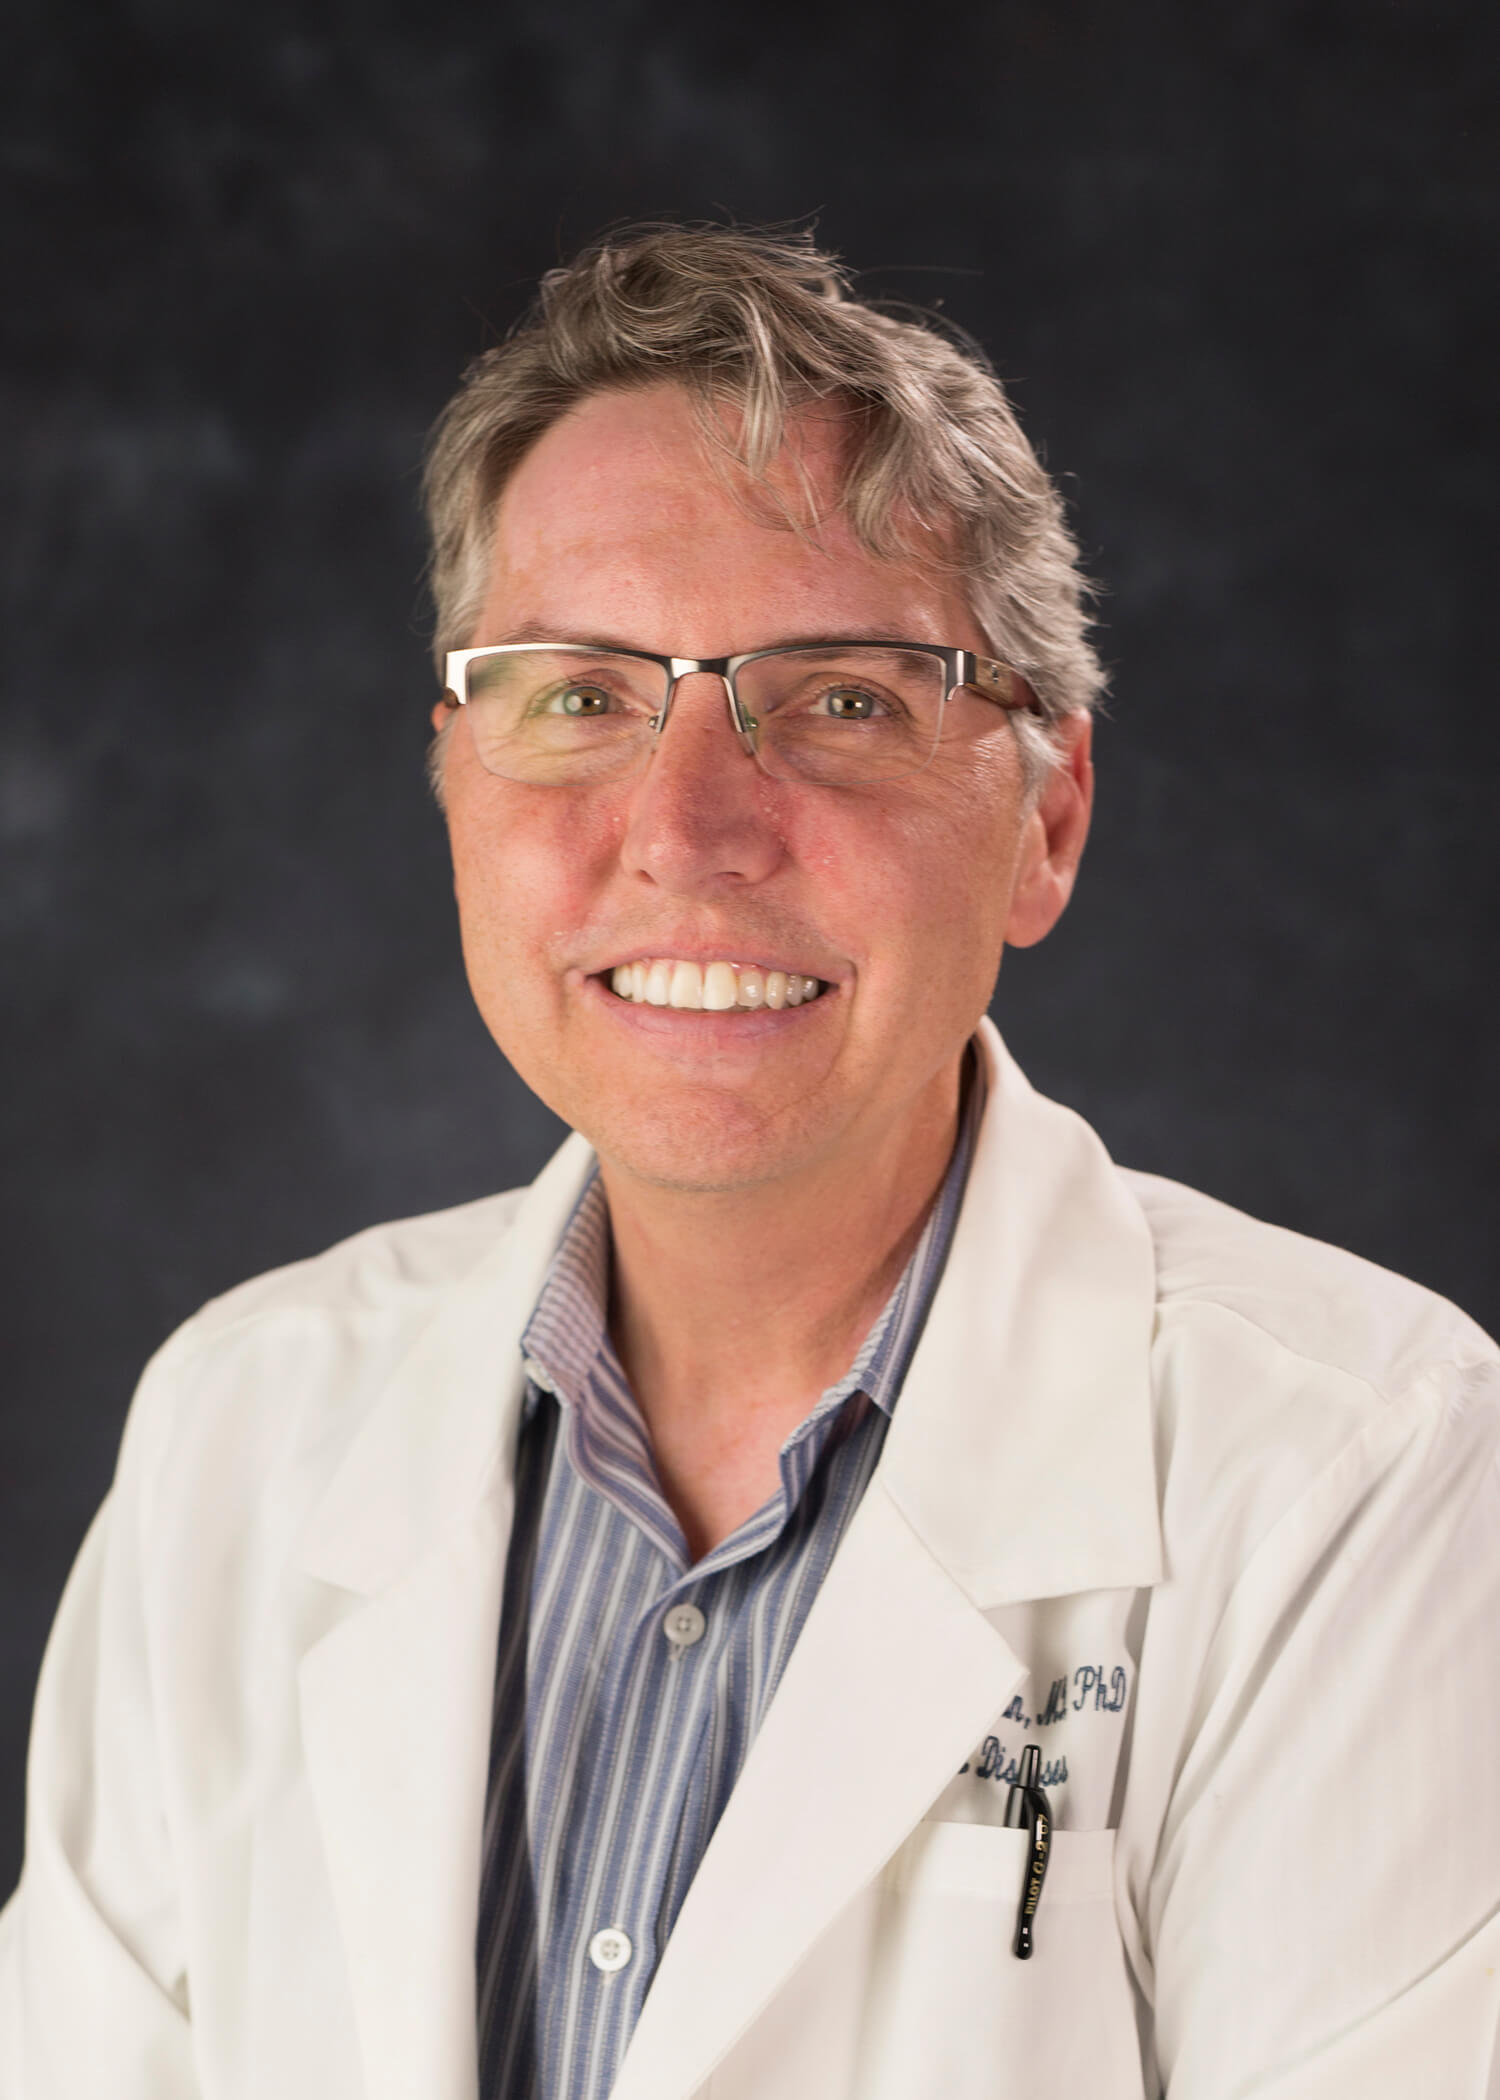 Photo of Jonathan Moorman, M.D.